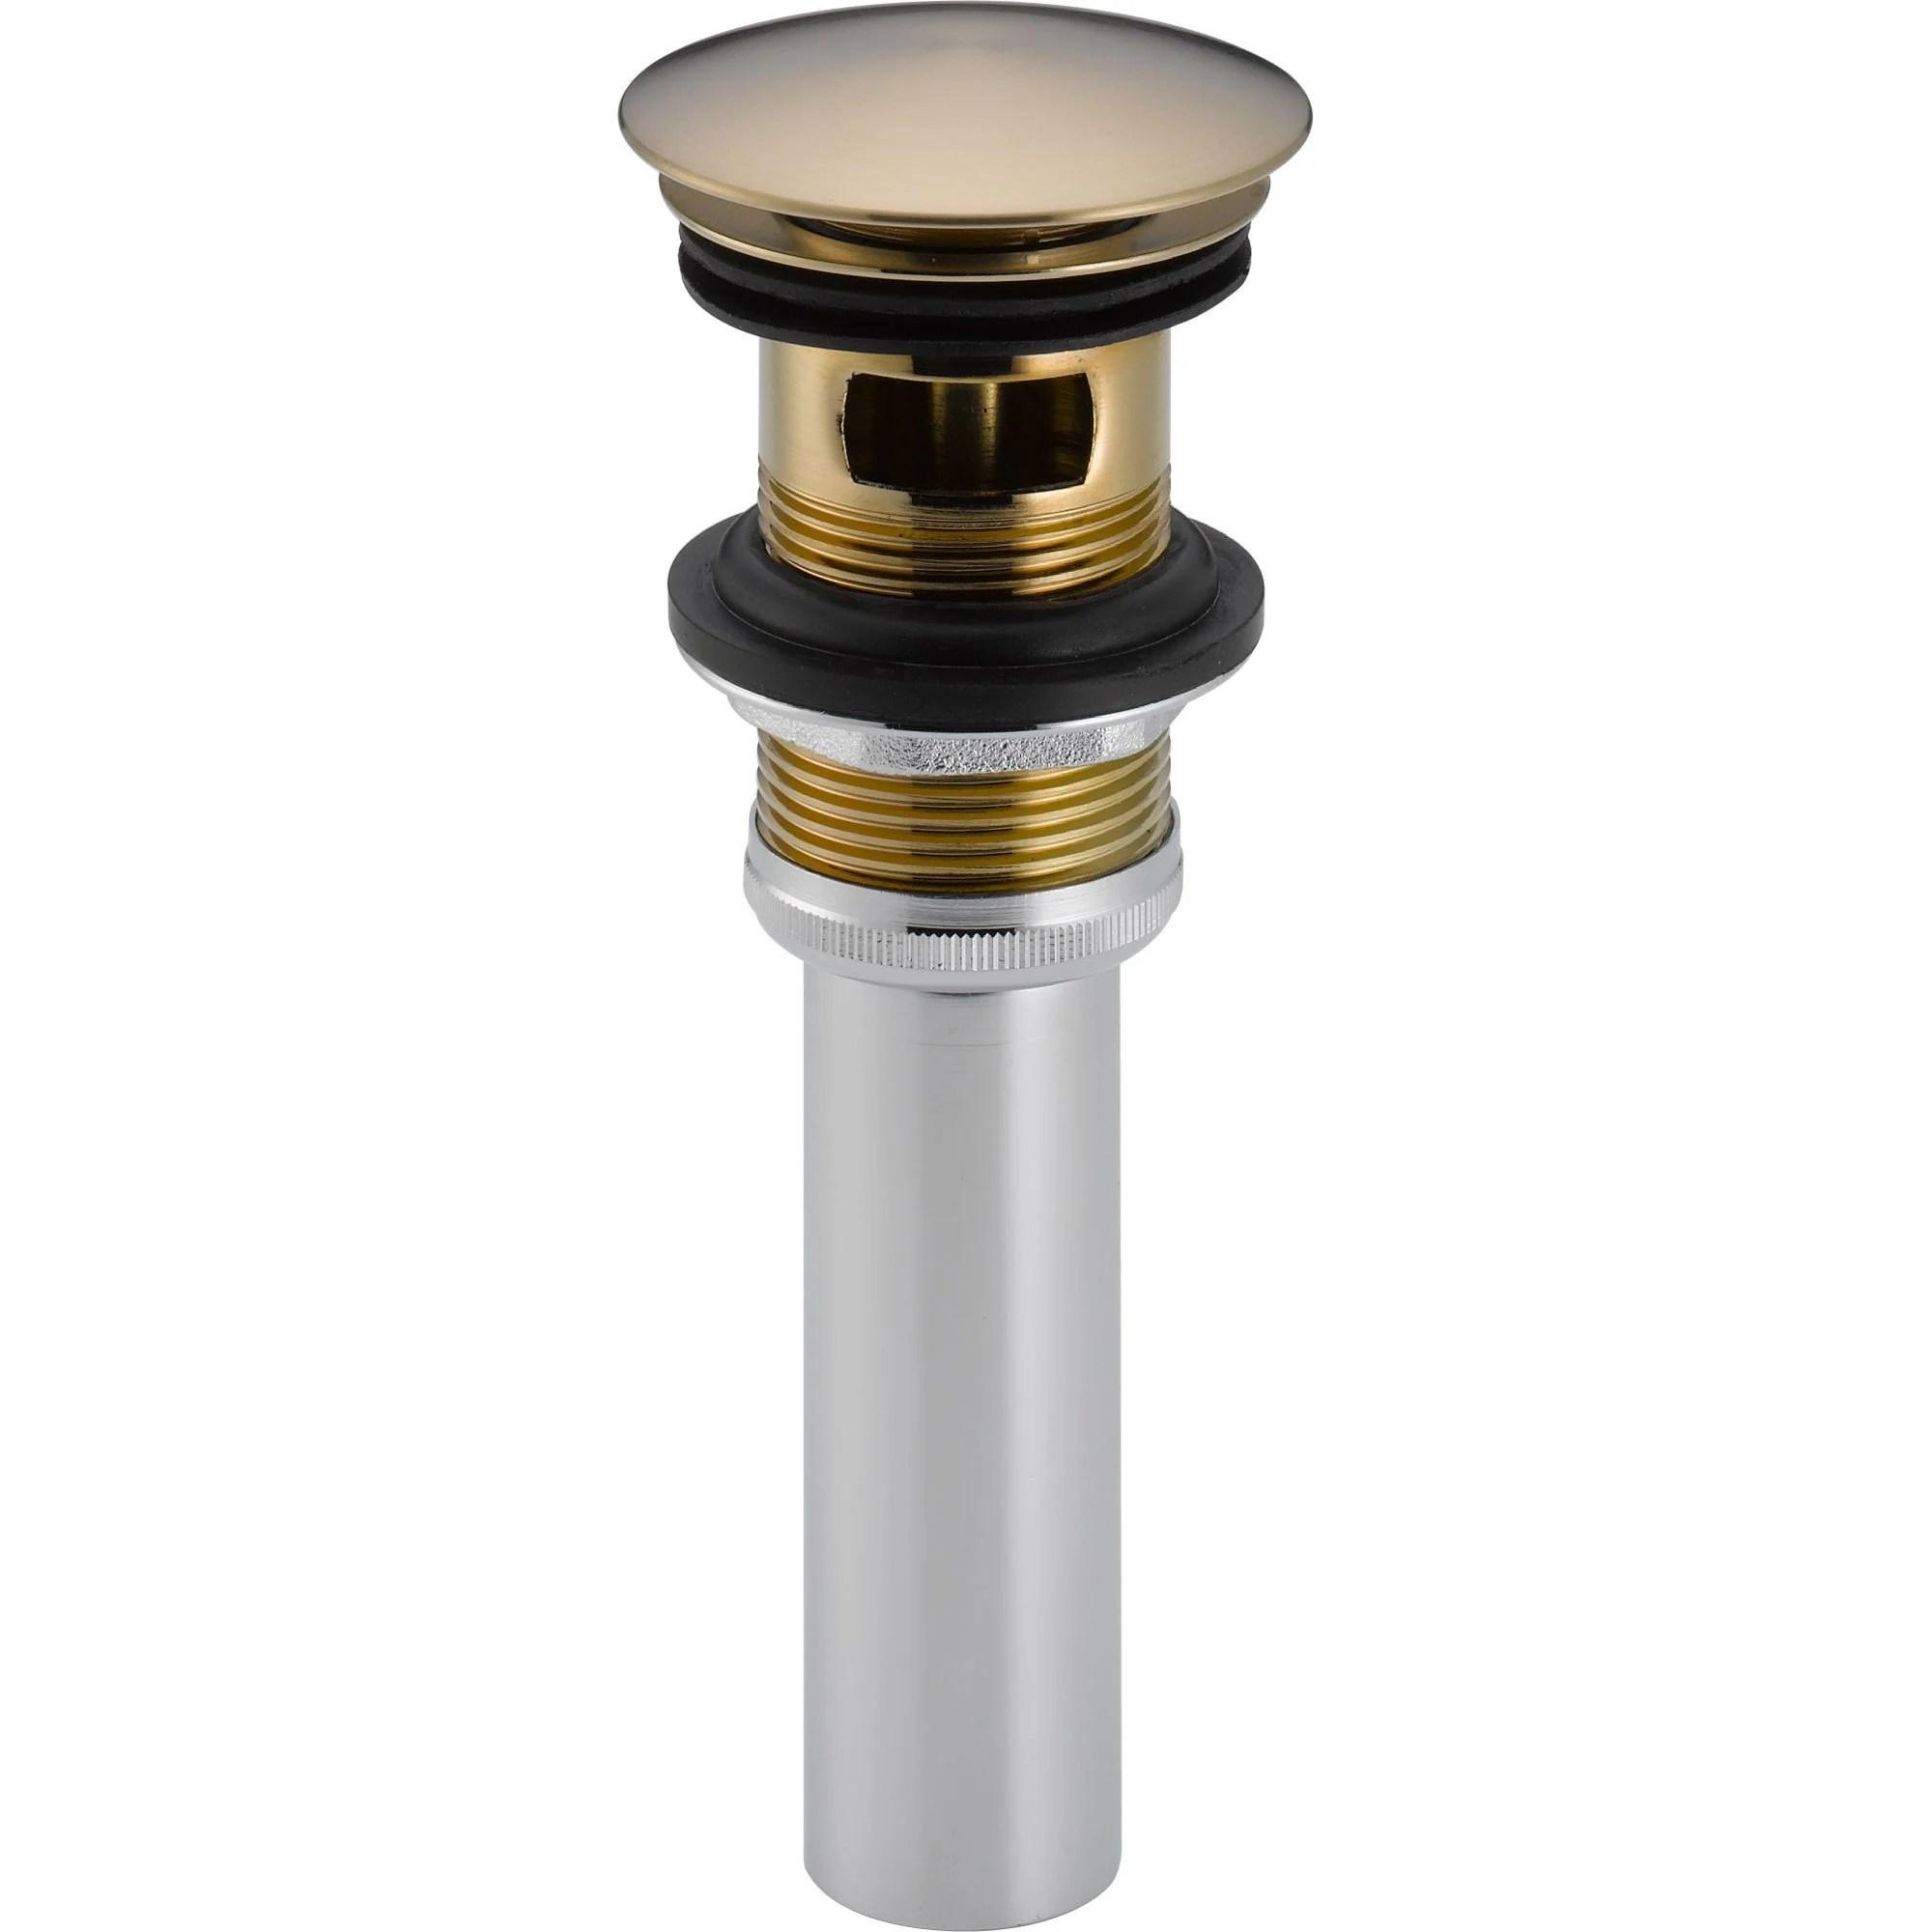 delta champagne bronze push pop up bathroom sink drain with overflow 525028